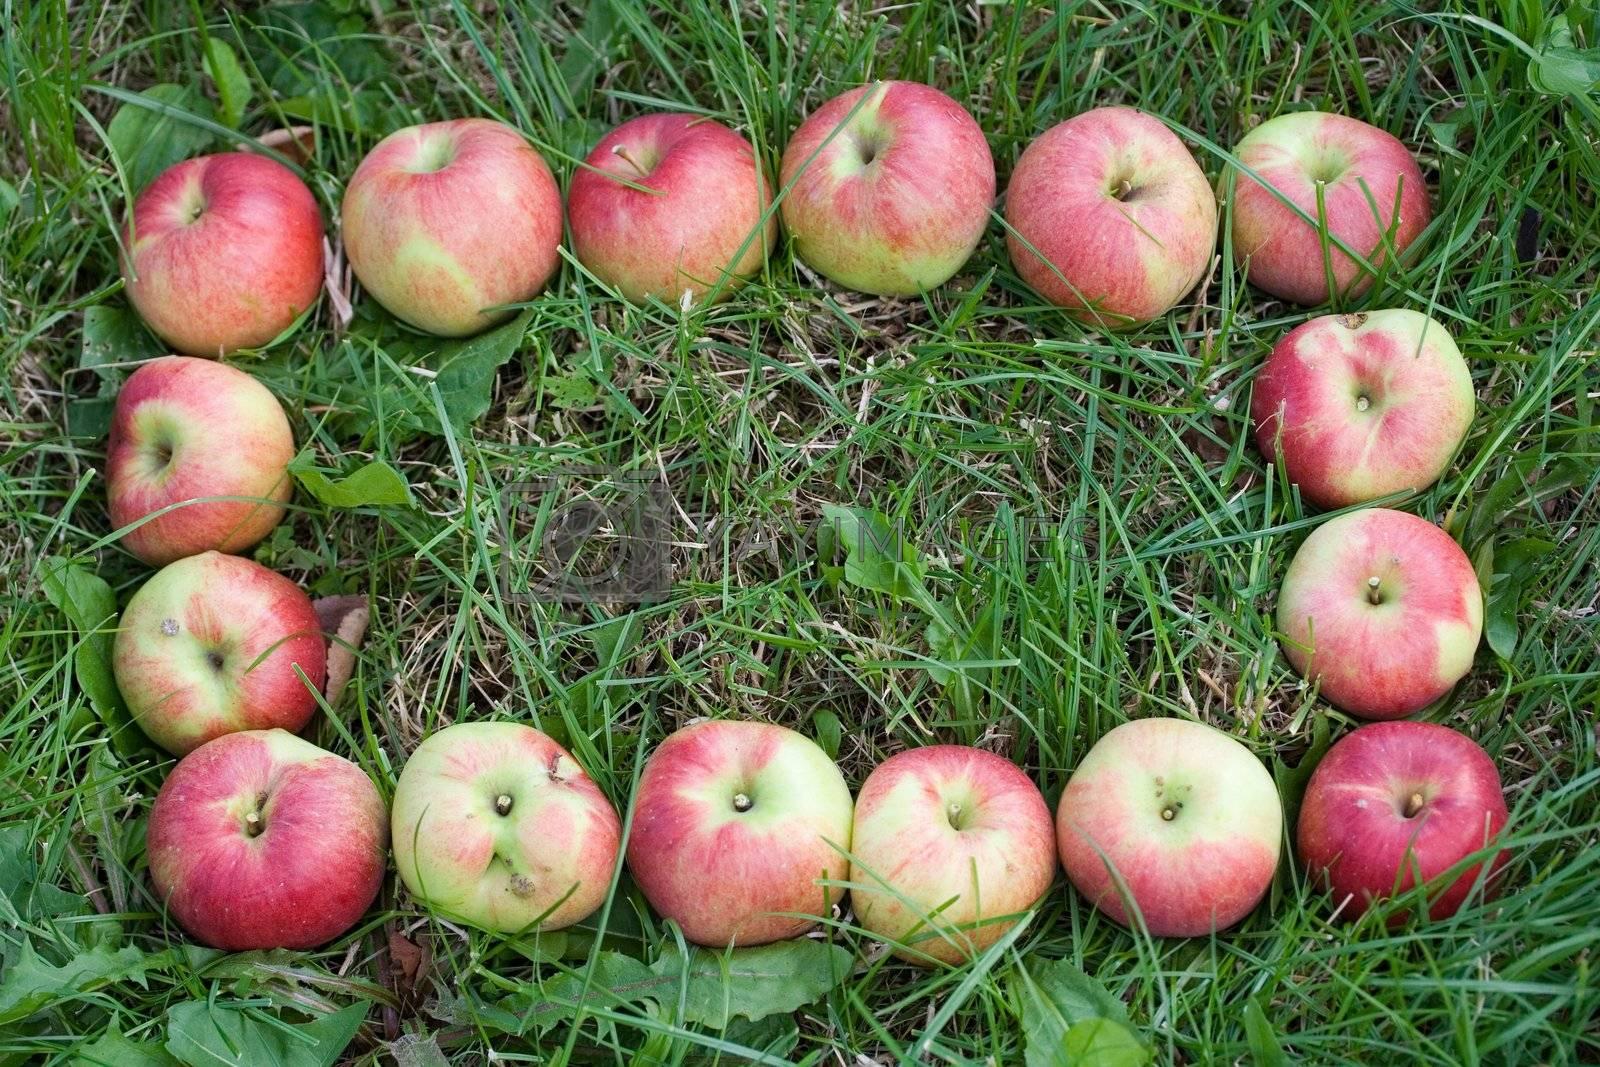 group food apple fruit decoration green background